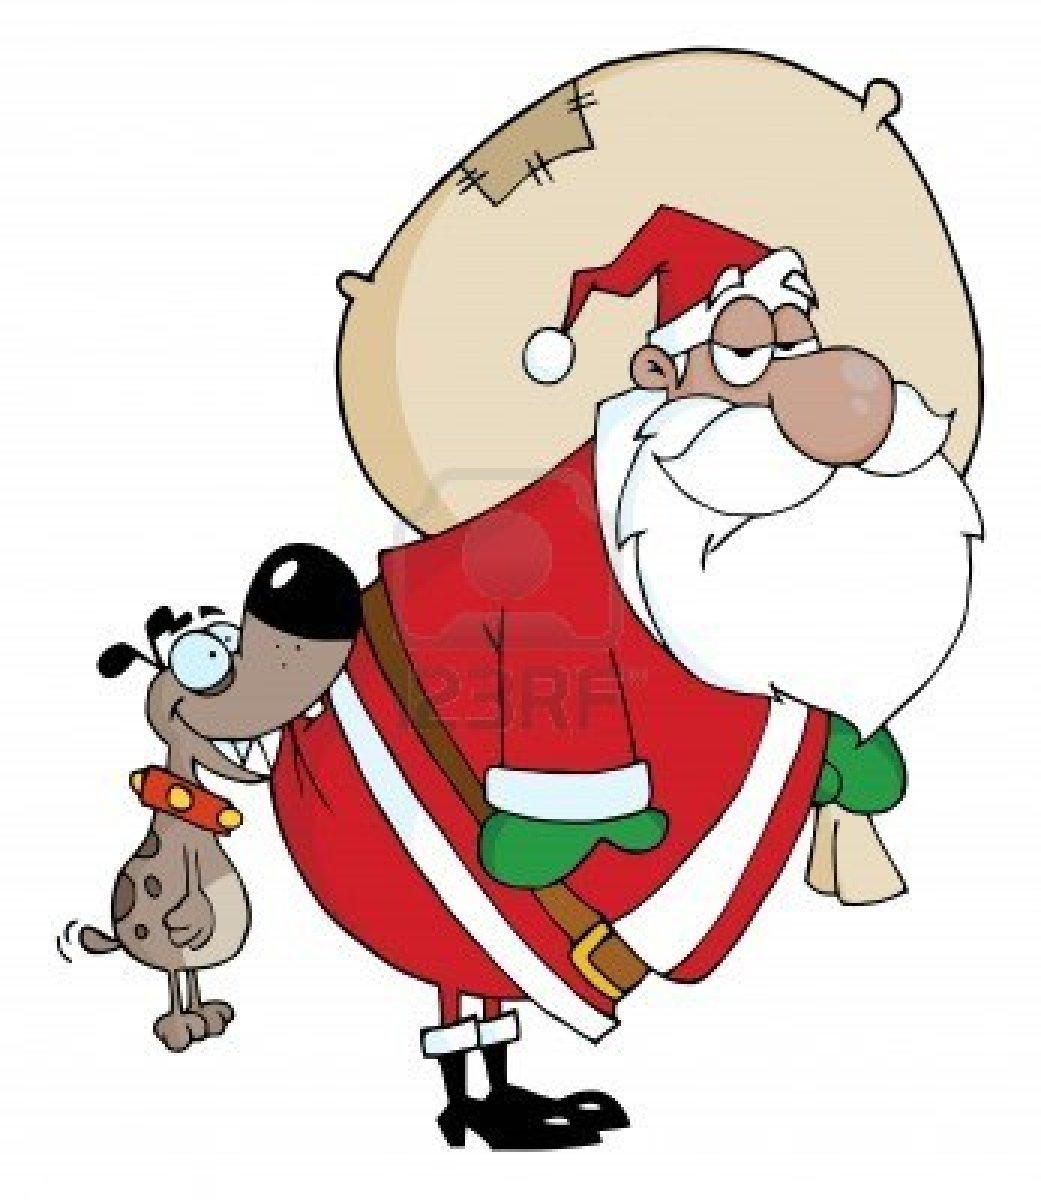 8644323-dog-biting-a-african-american-santa-claus